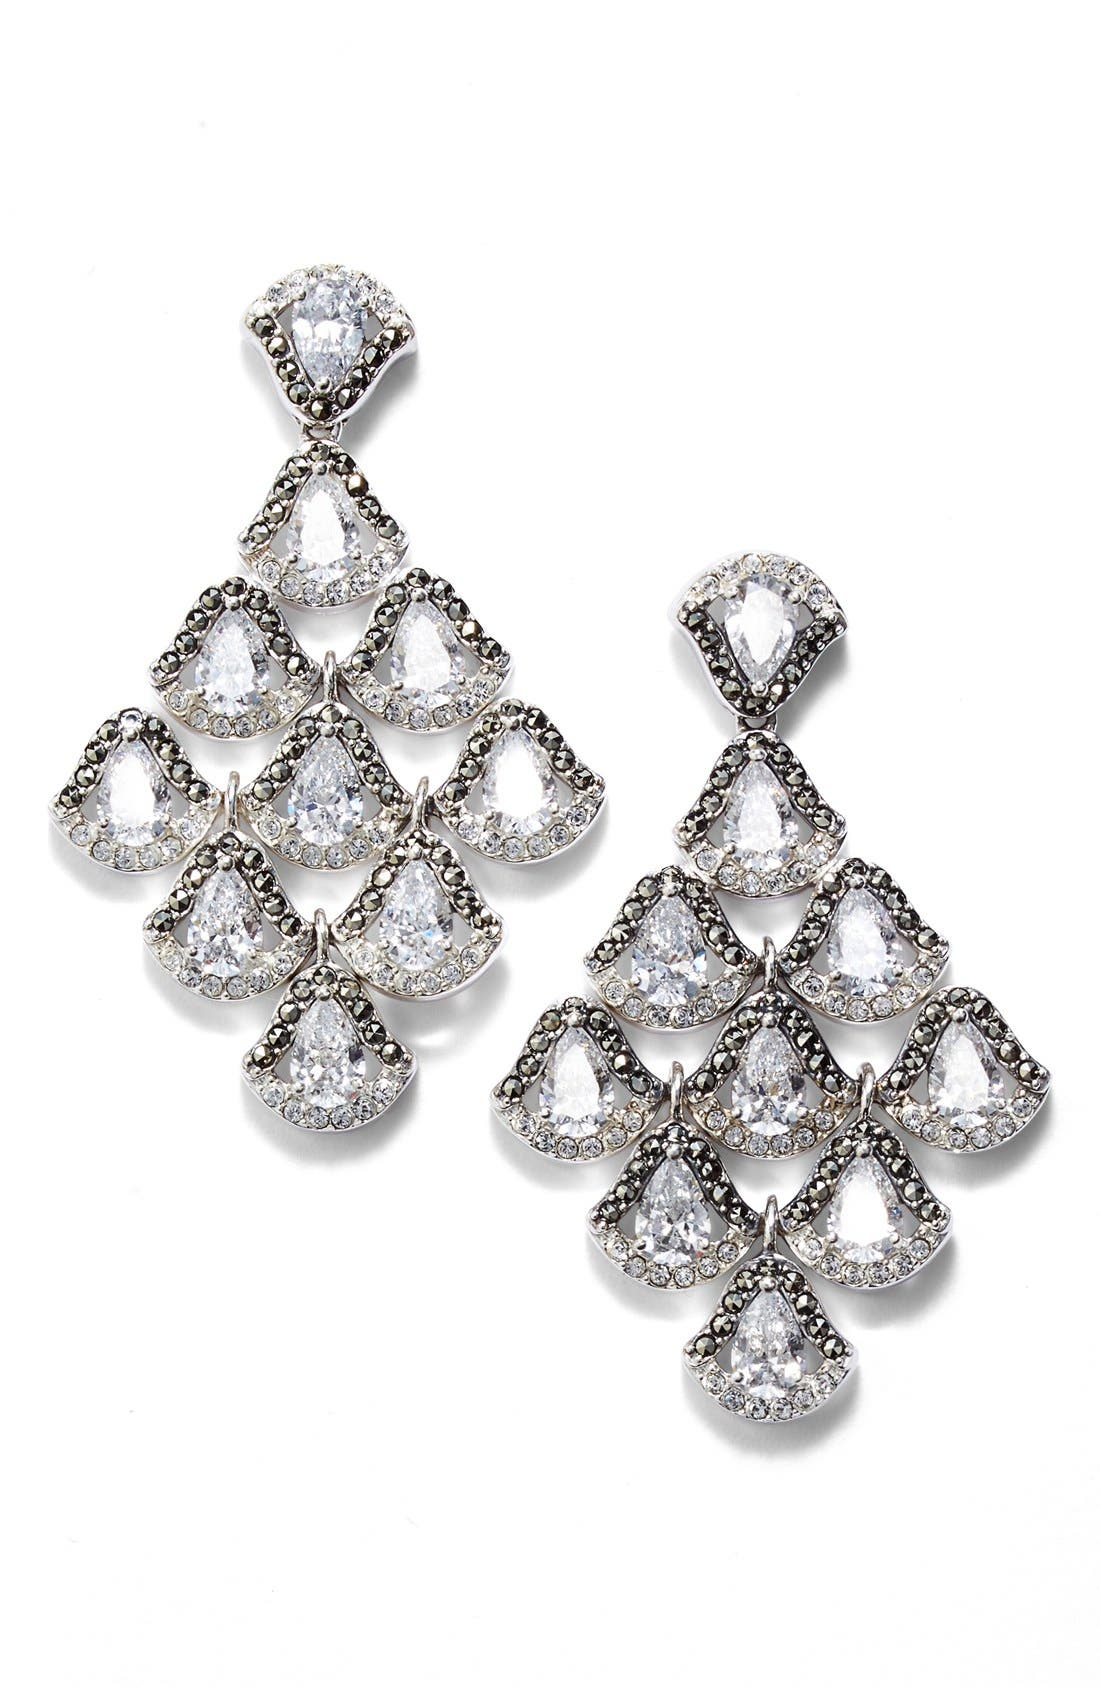 Main Image - Judith Jack Semiprecious Stone Chandelier Earrings